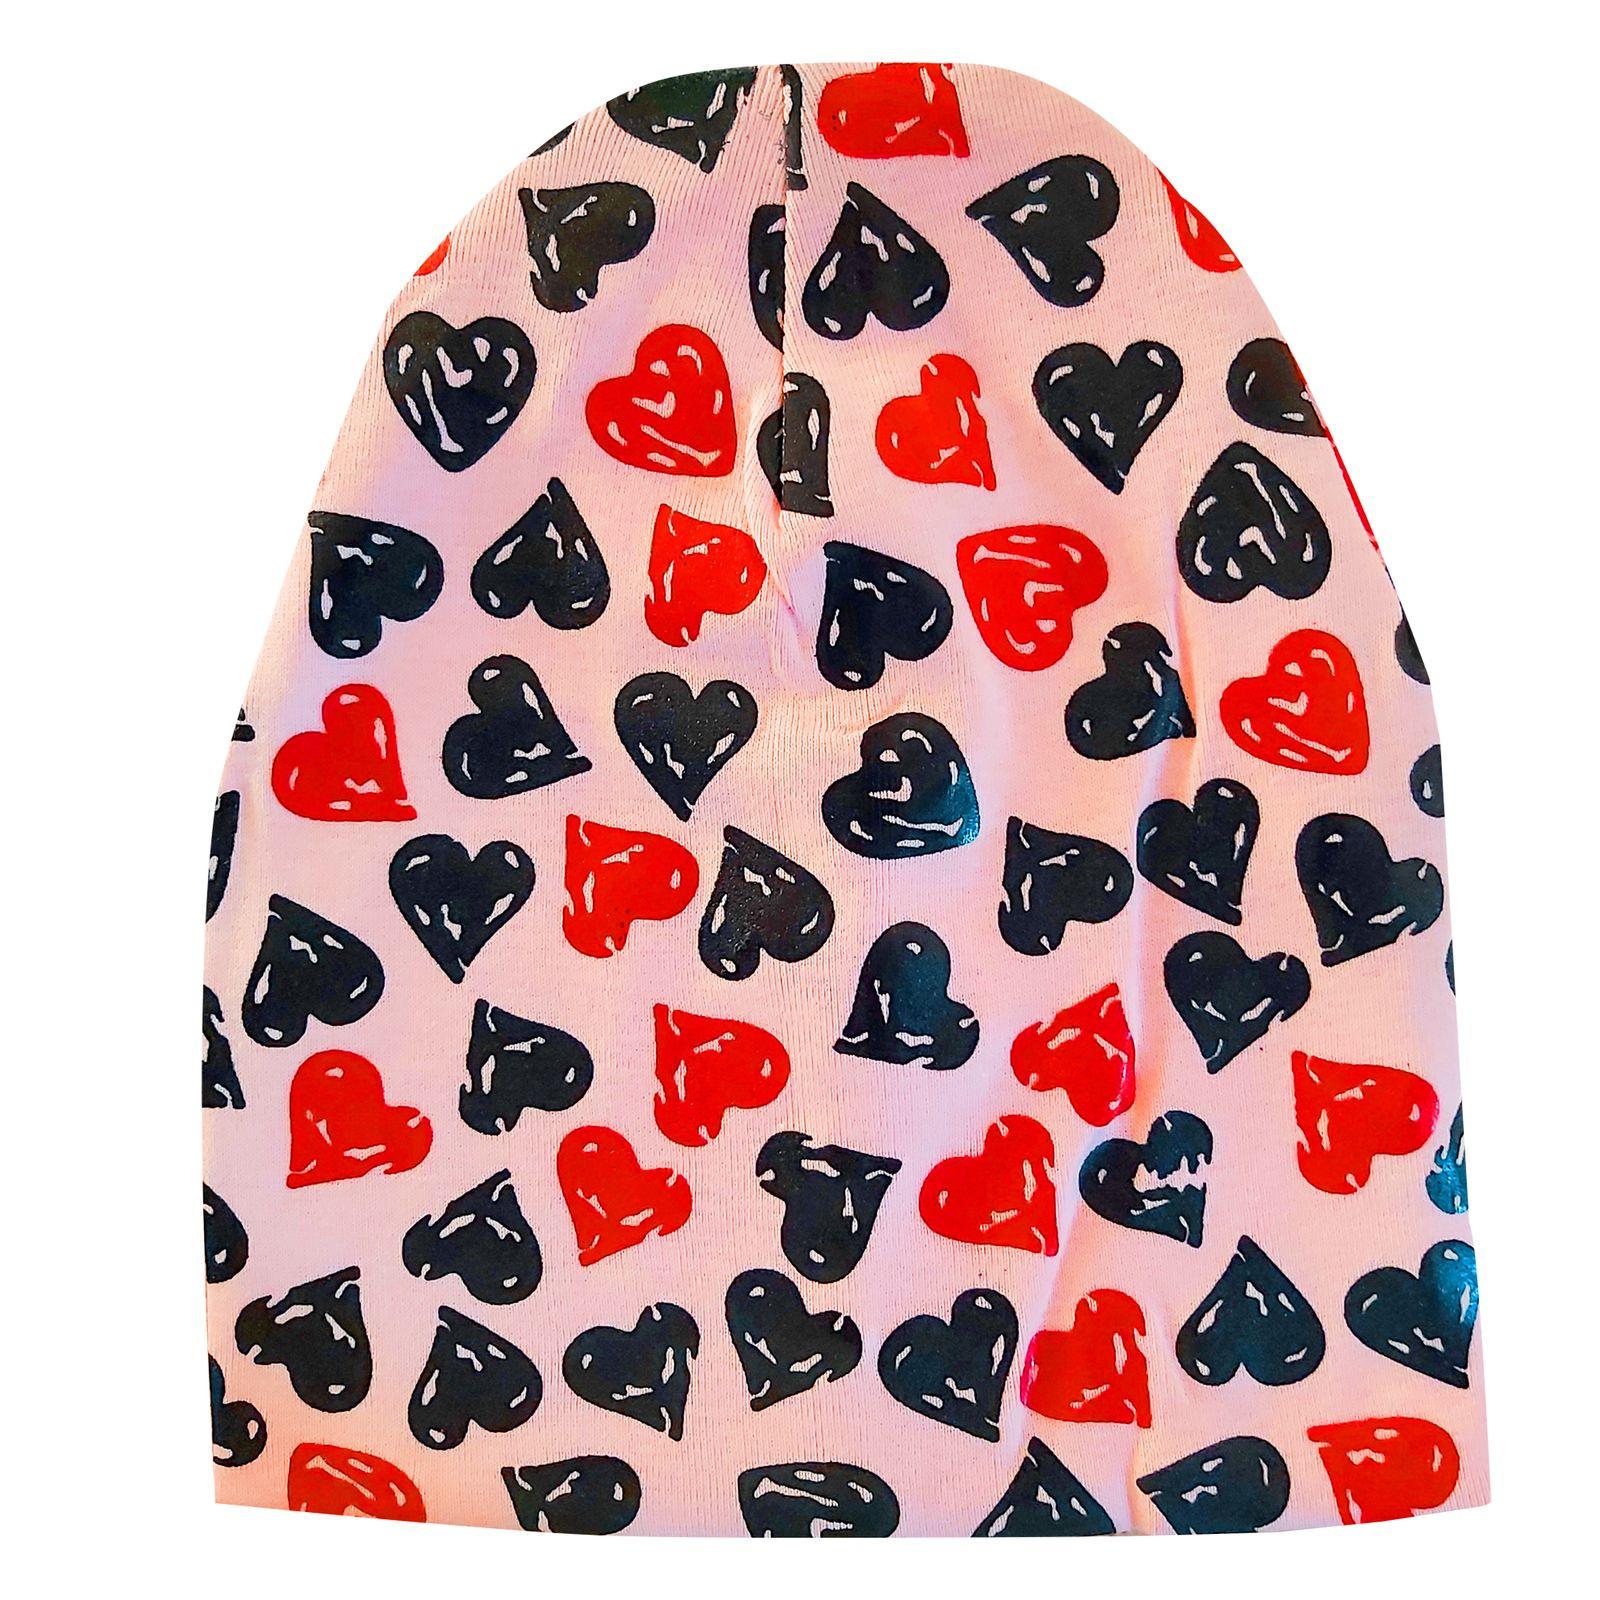 کلاه دخترانه مدل قلب کد LP04 -  - 2